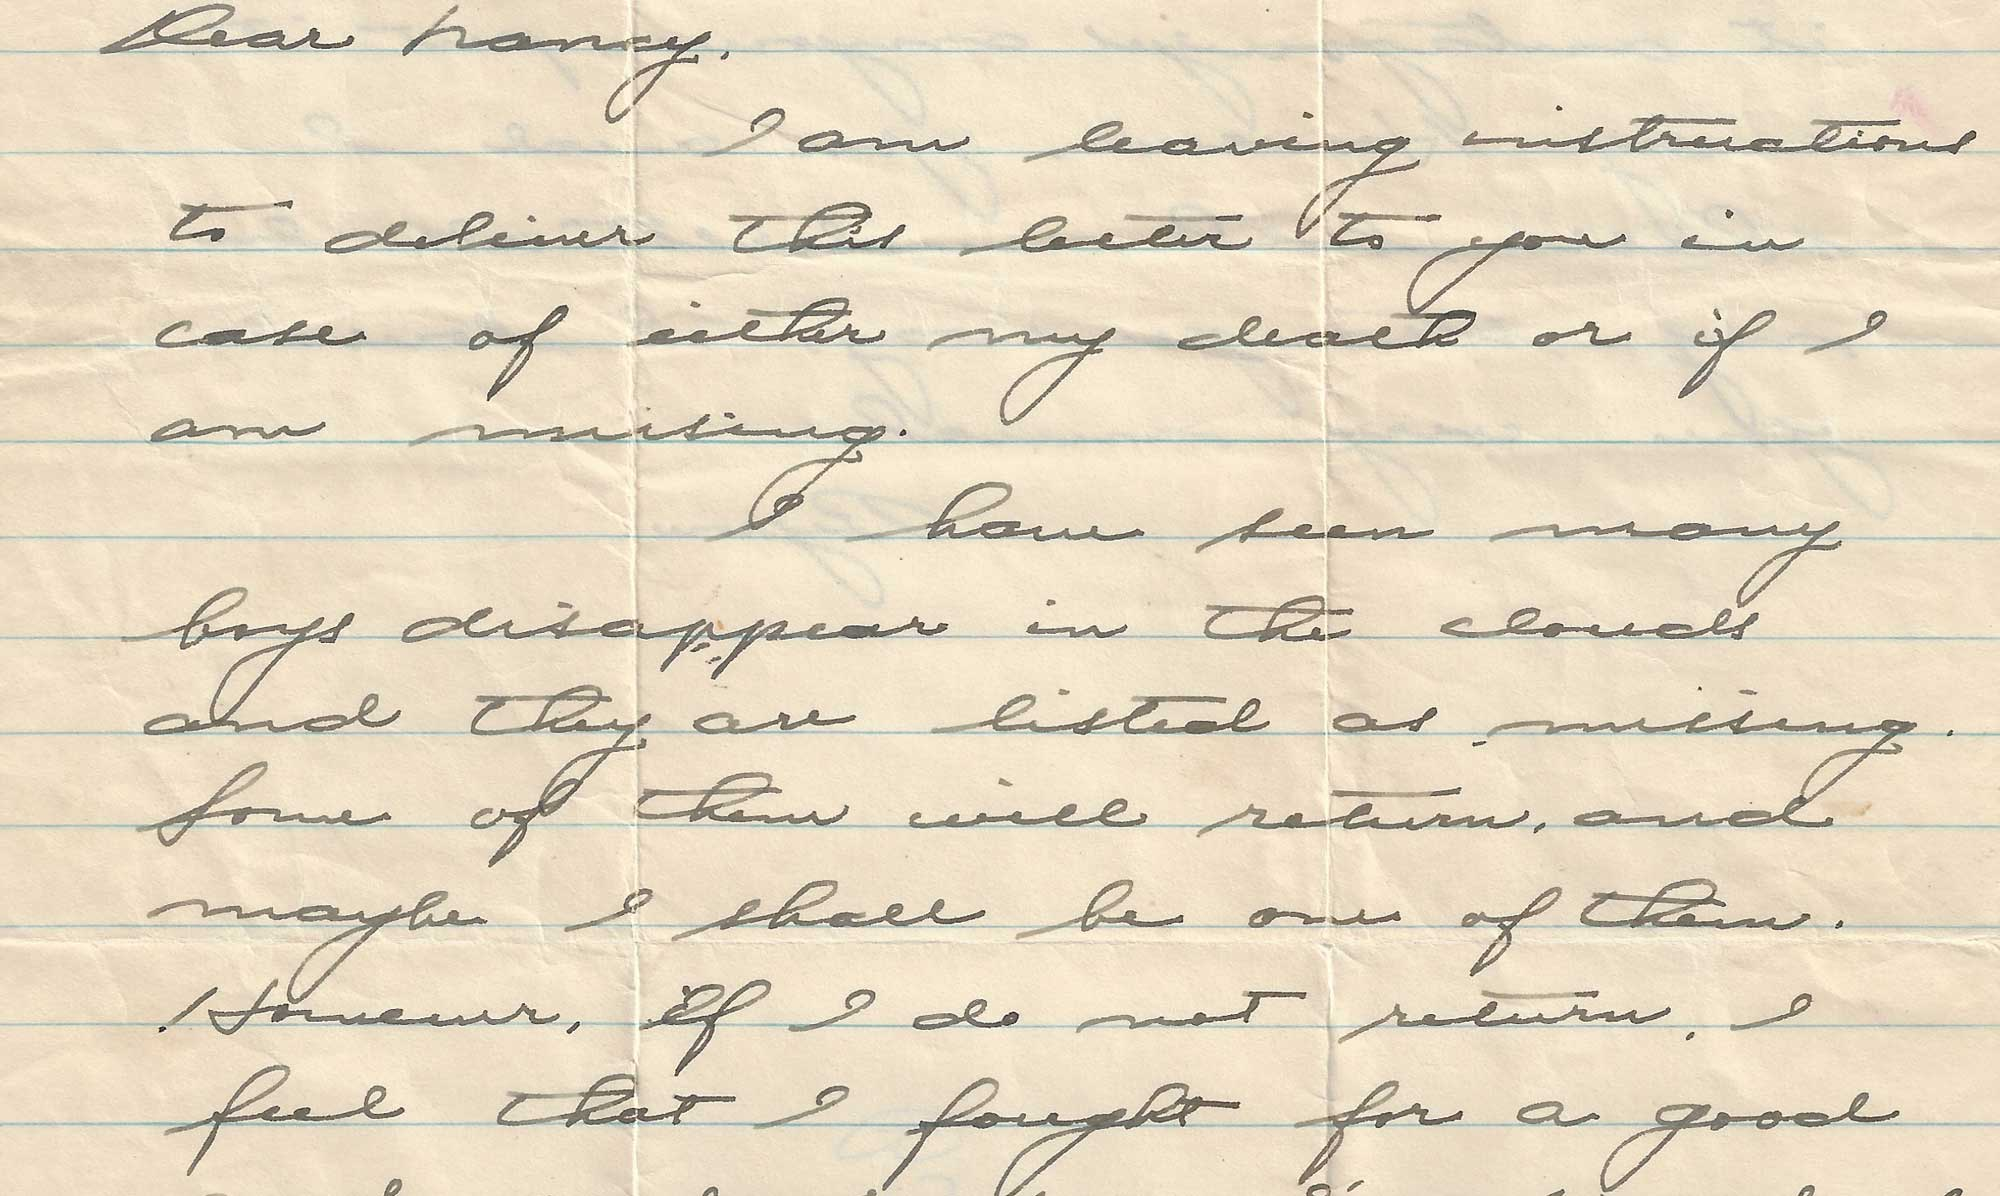 Bryan's Letter